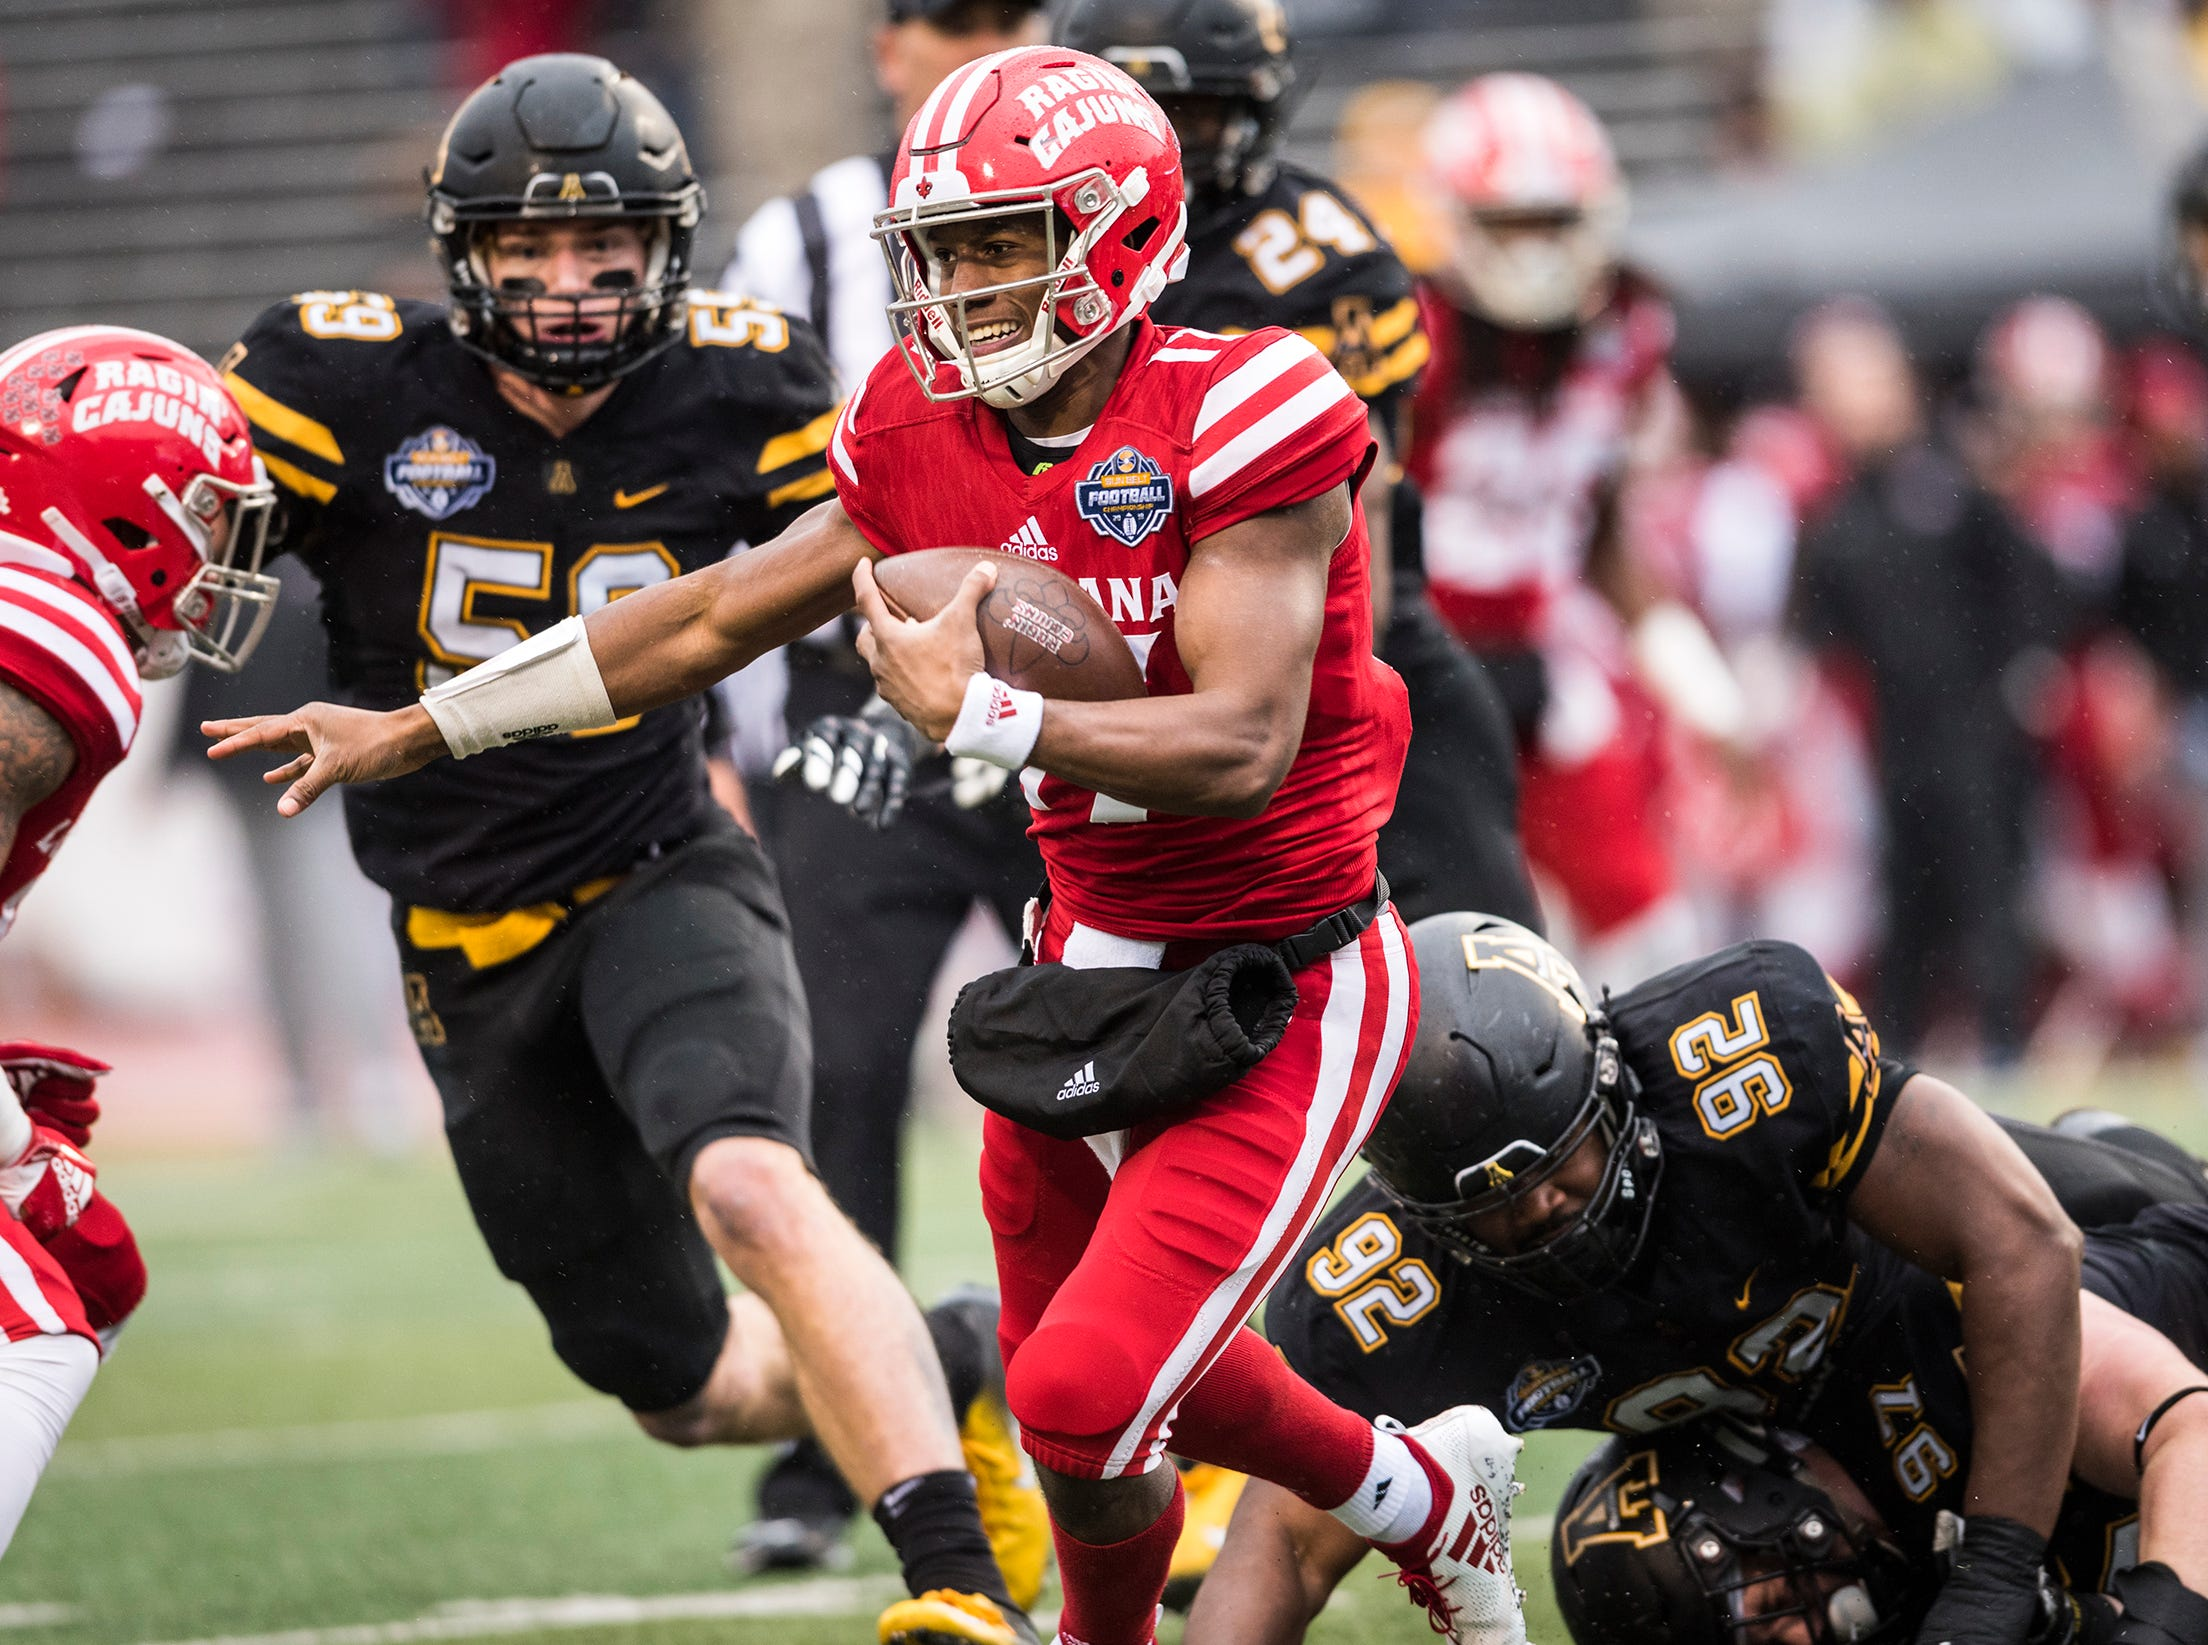 Louisiana  quarterback Levi Lewis (17) runs the ball on Saturday, Dec. 1, 2018 in Boone, N.C.